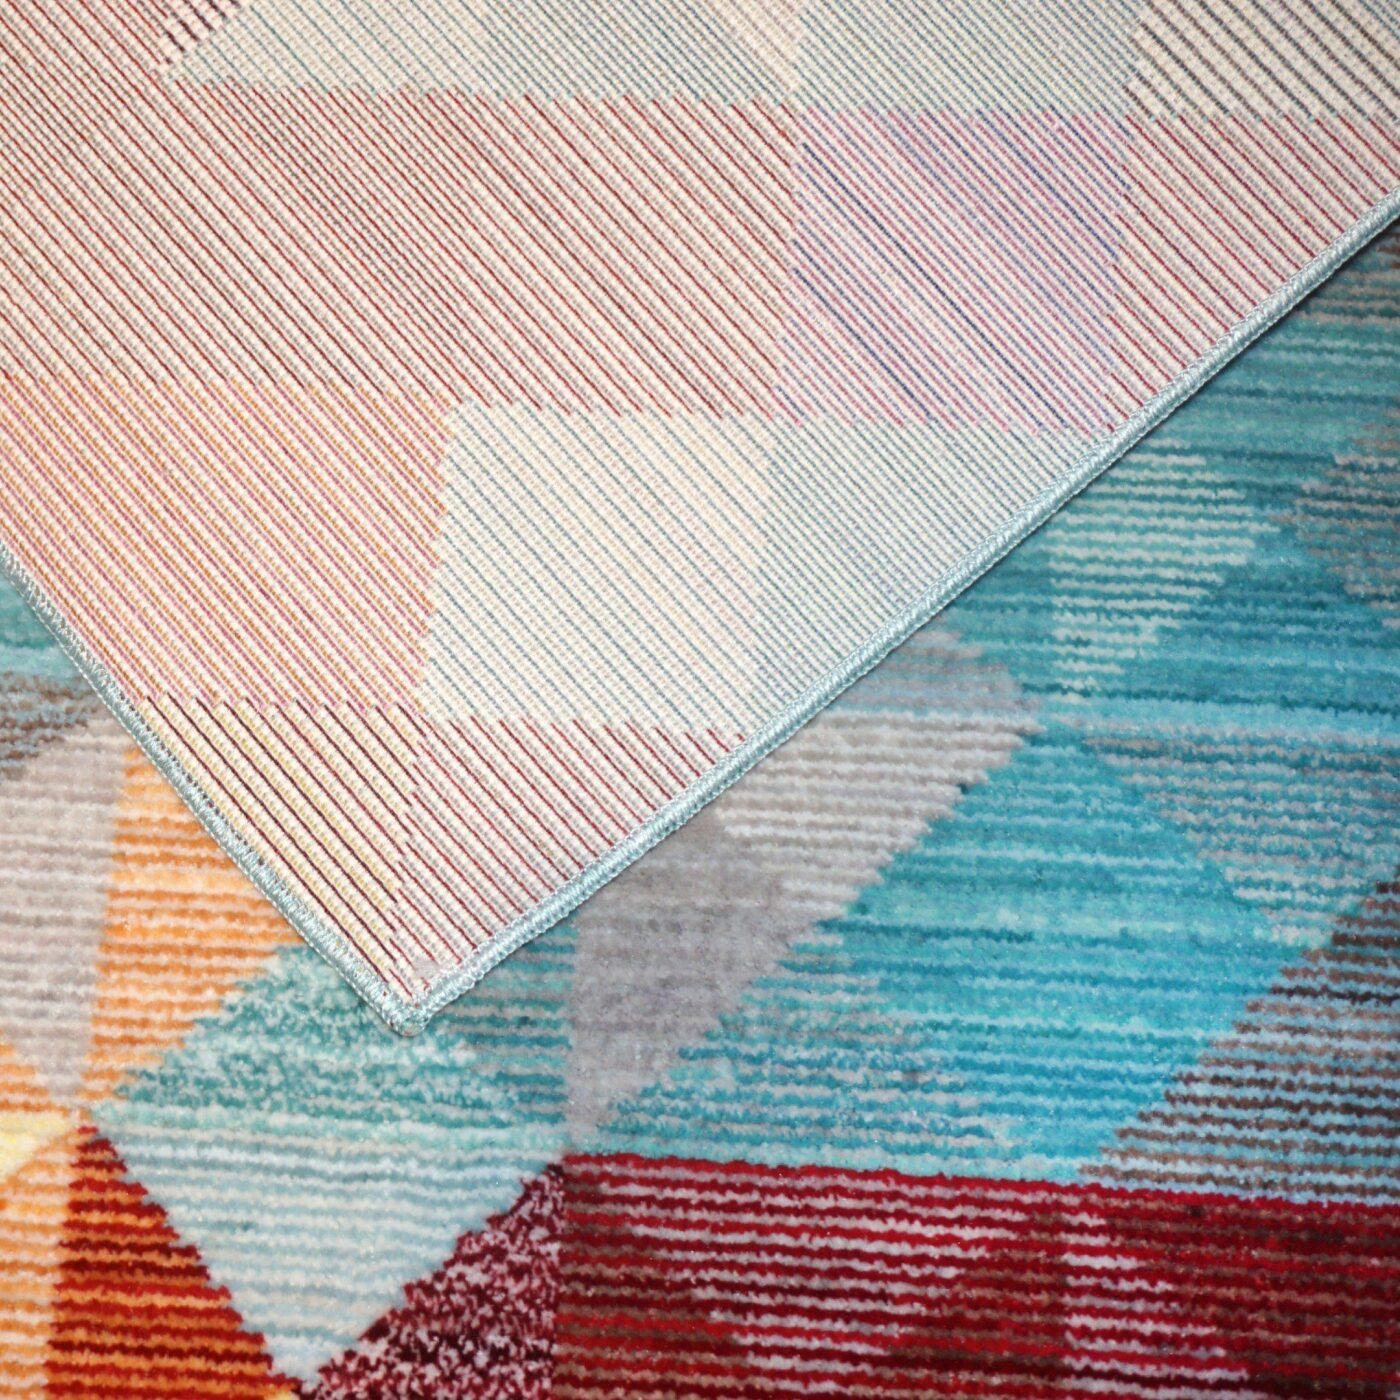 Astra Shining Teppich 001 – 140 x 200 cm – Detail